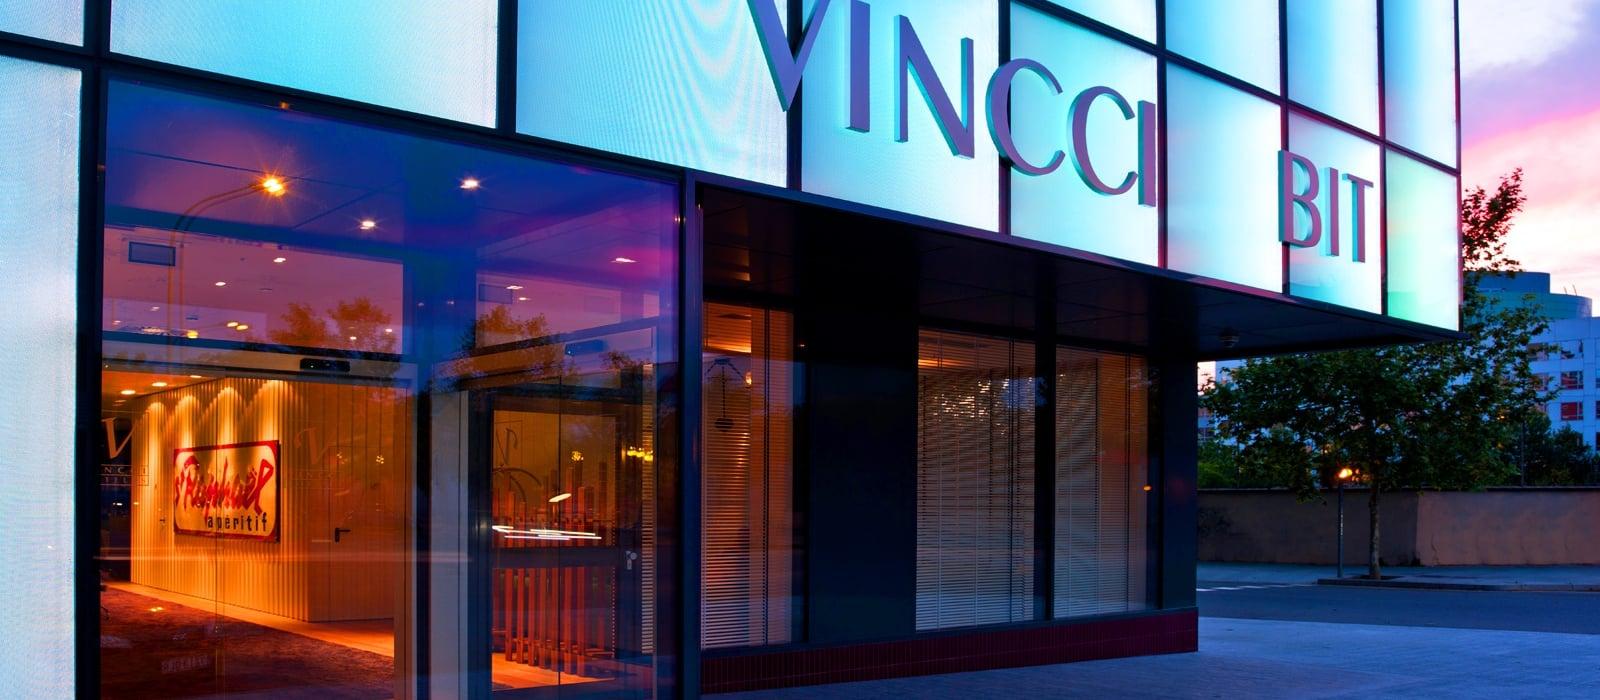 Fassade - Vincci Bit 4*